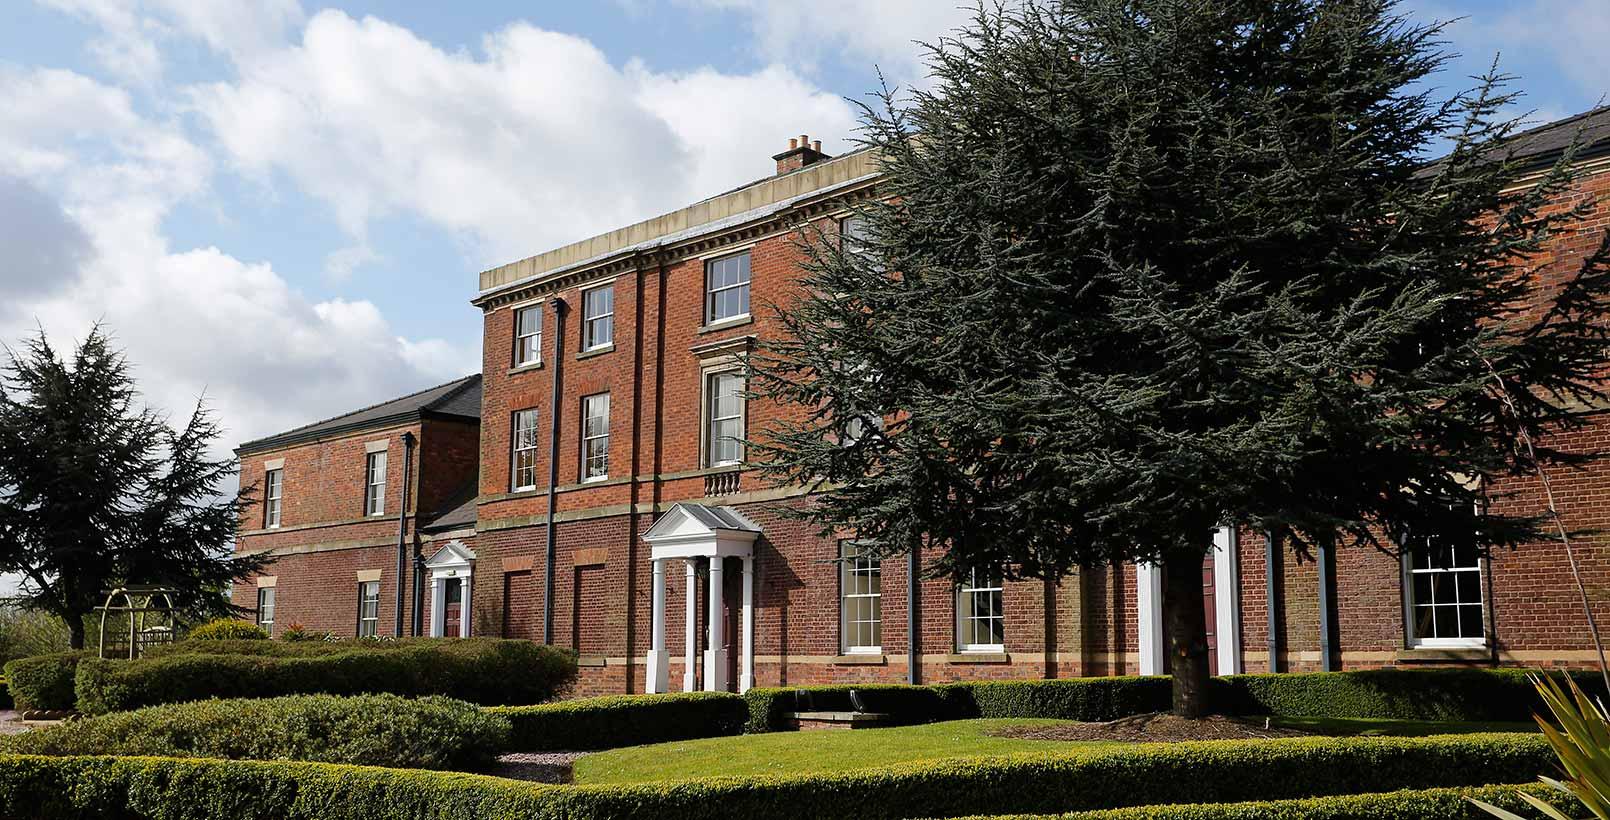 Best Western Plus Stoke On Trent Moat House